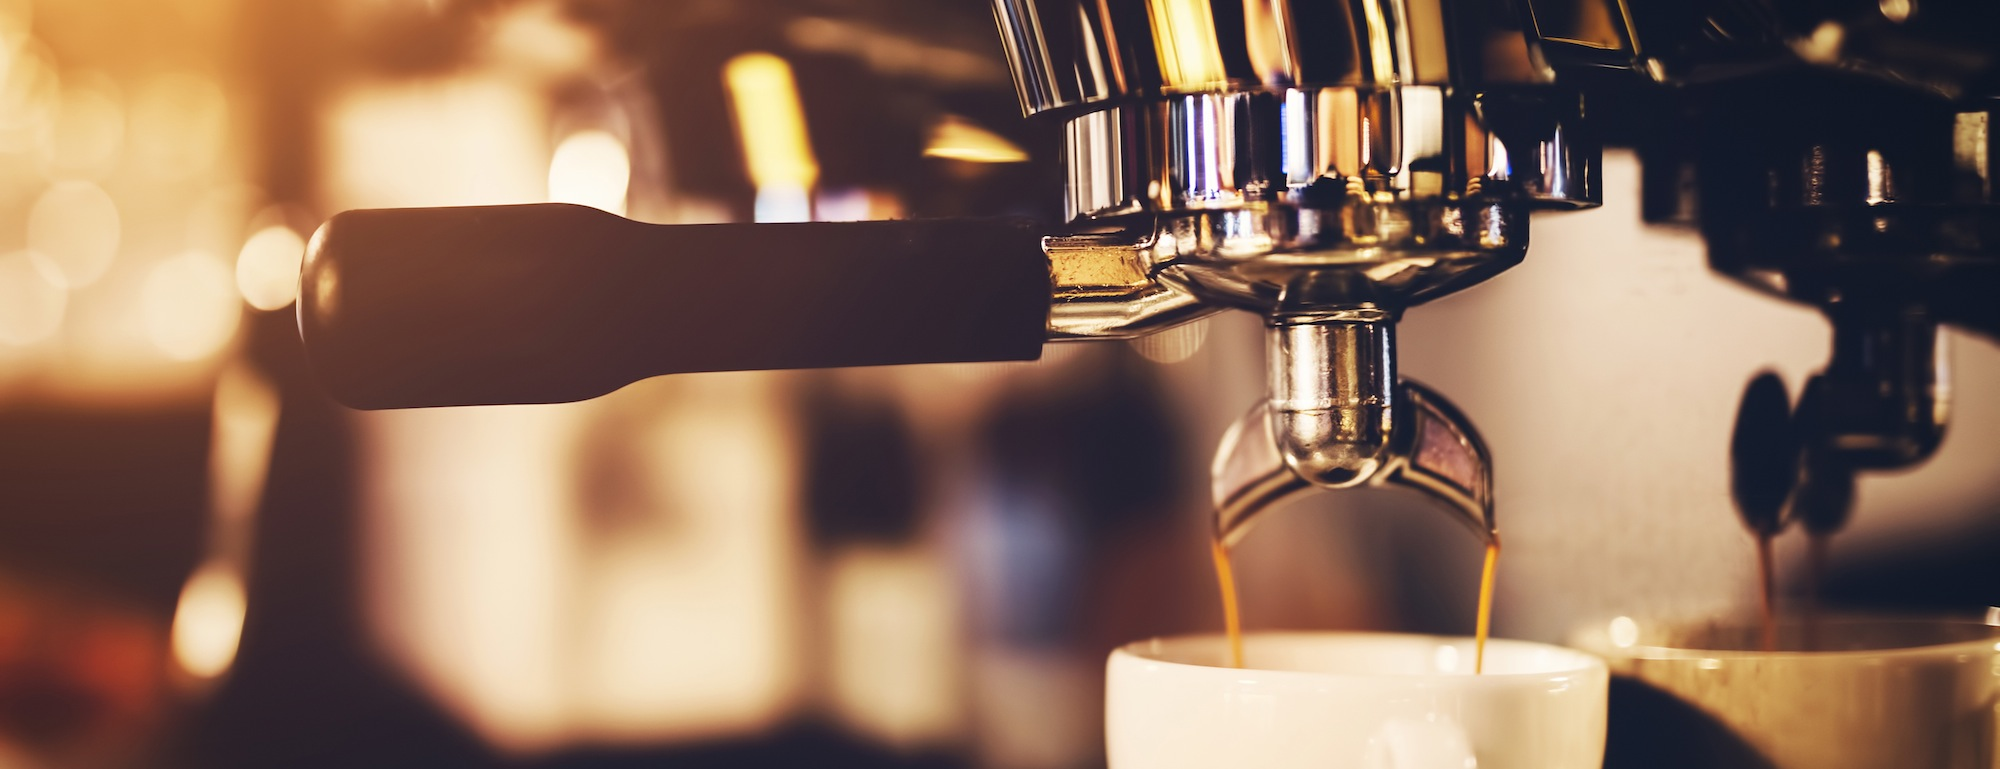 kaffeewagen hannover mobile kaffeebar header